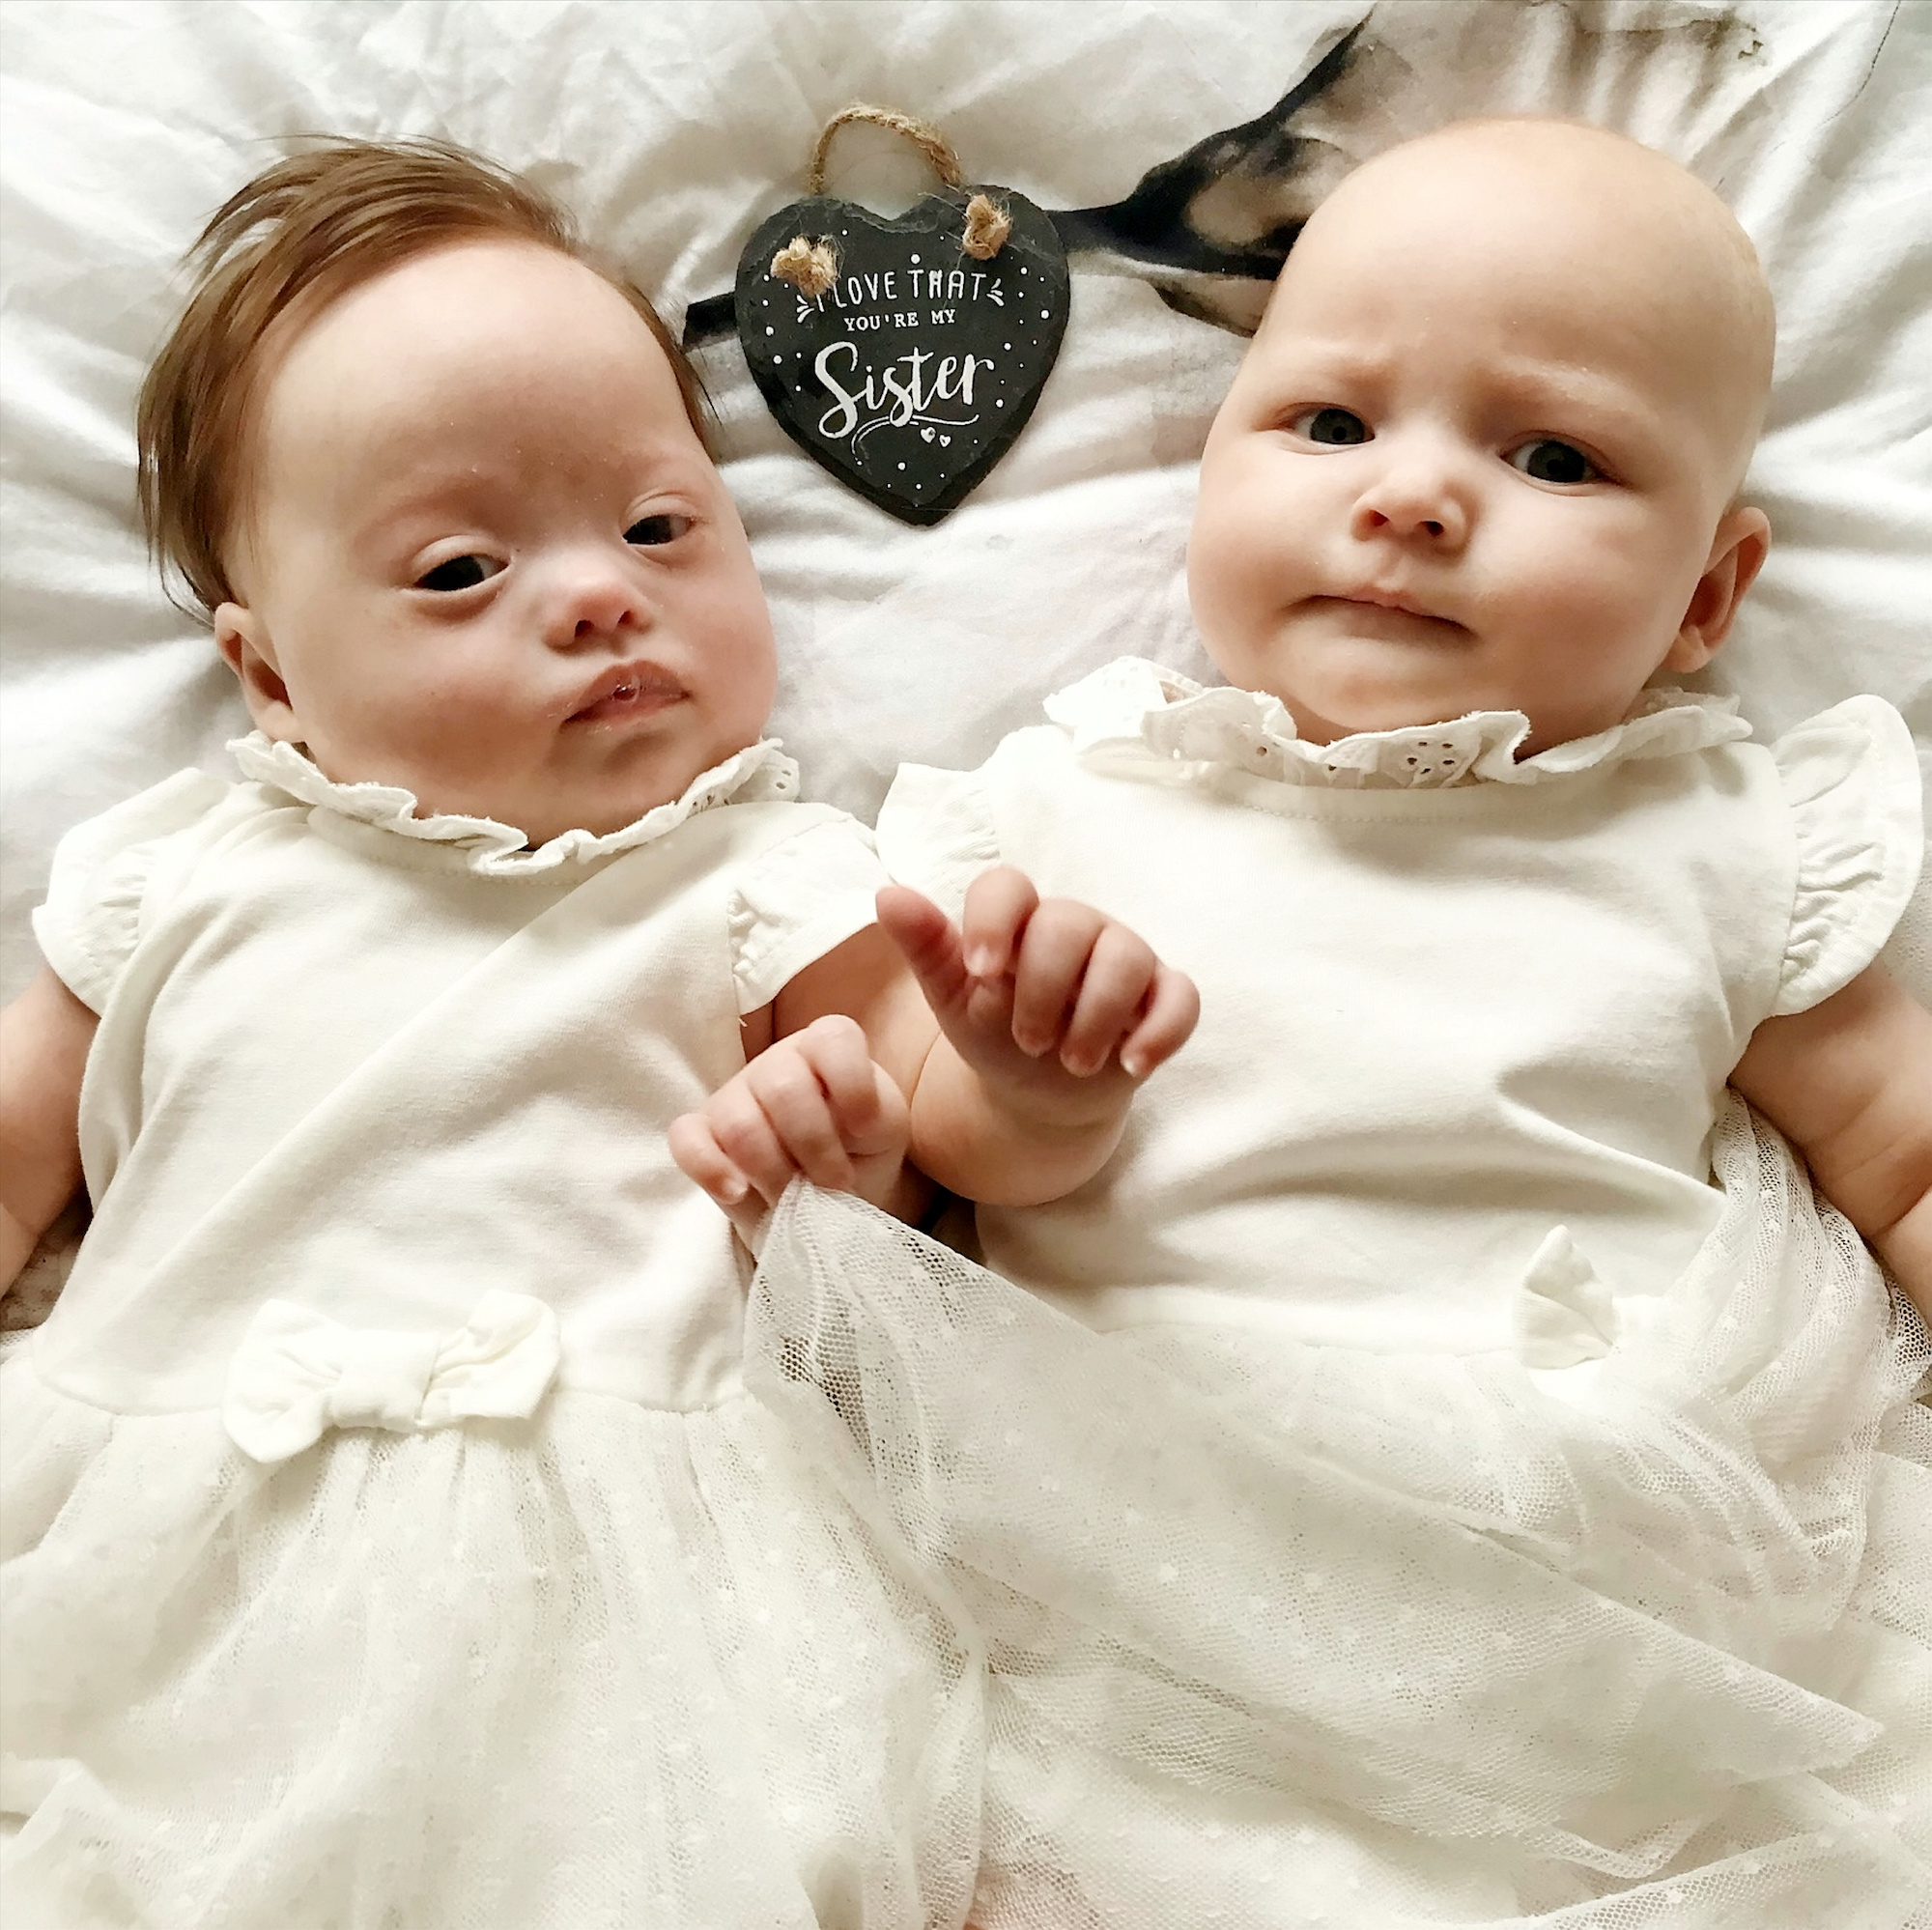 Mια στο εκατομμύριο: Γεννήθηκαν δίδυμα, το ένα με σύνδρομο down και το άλλο χωρίς - Εικόνα 4